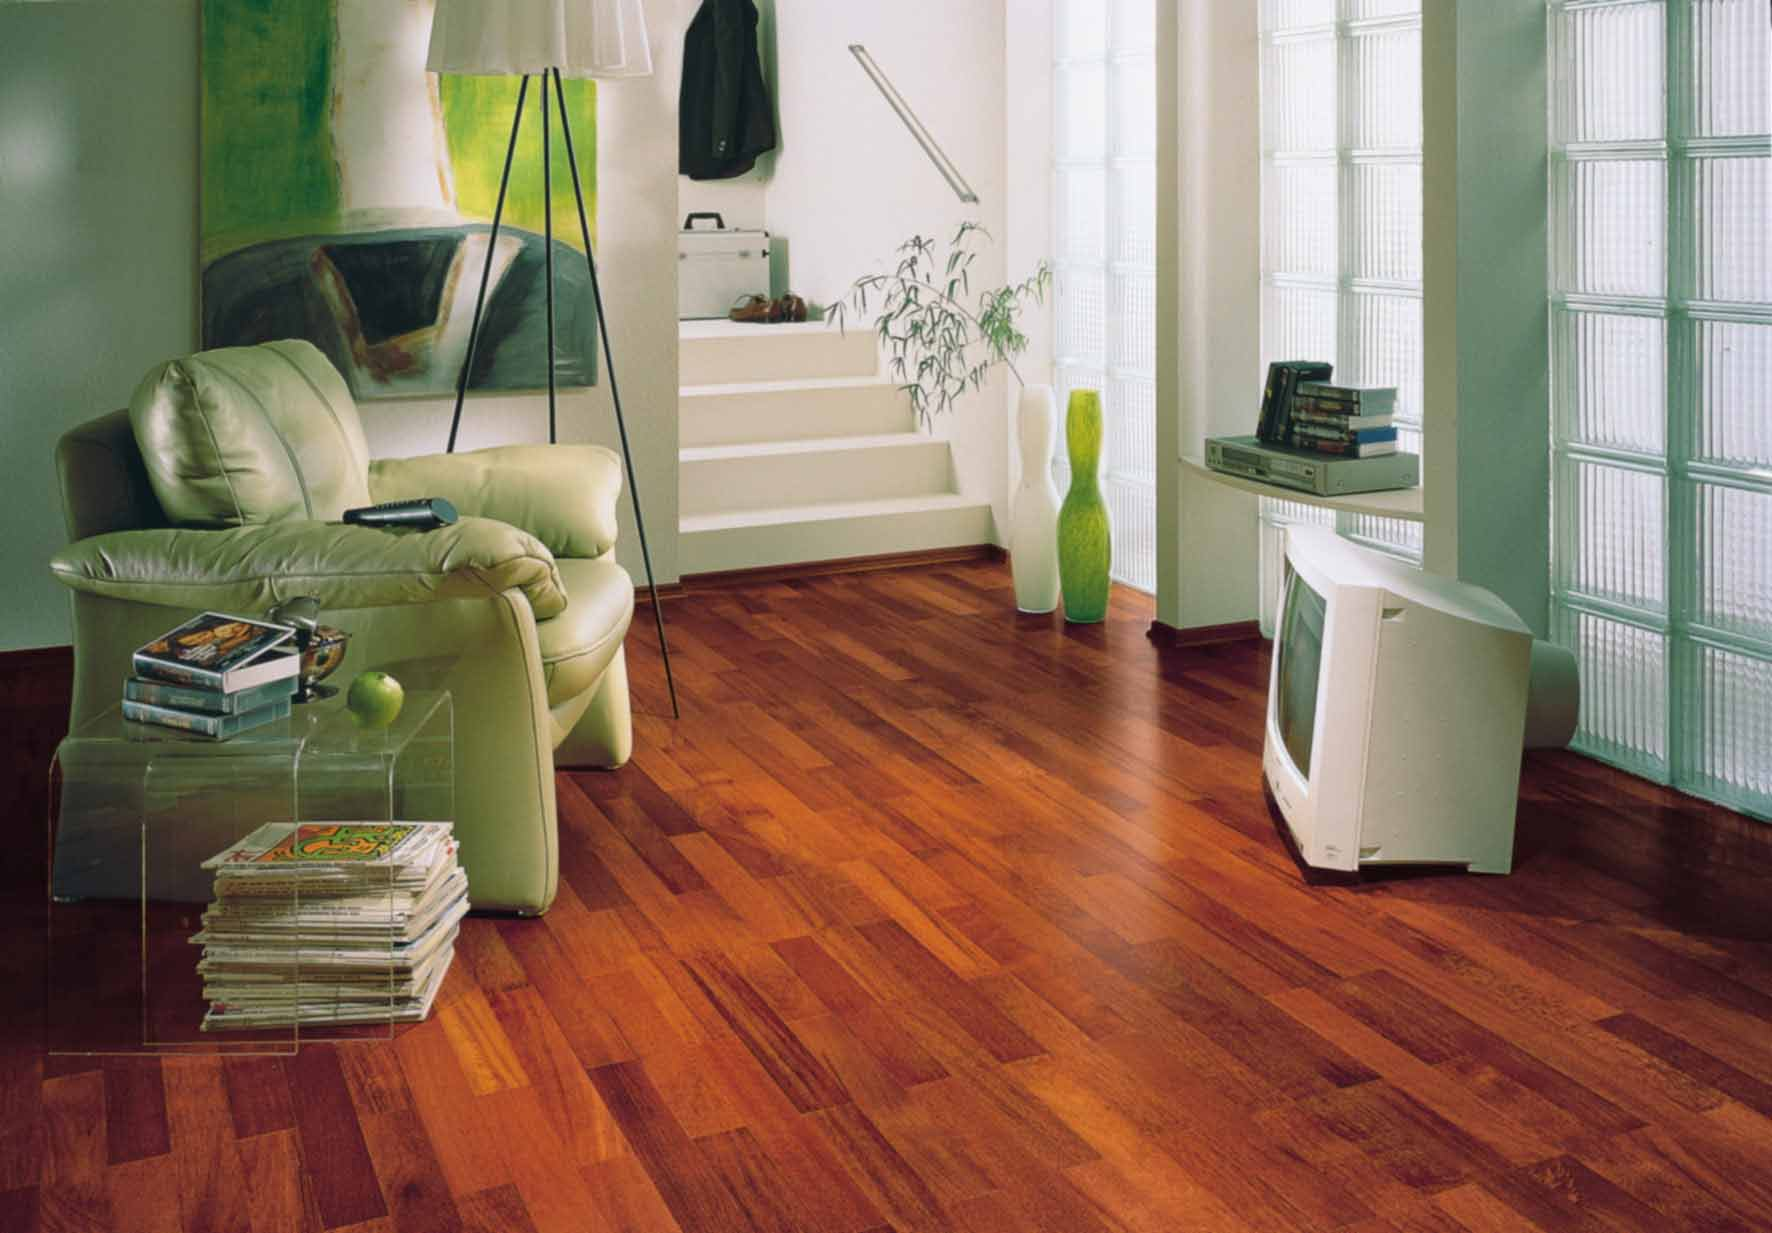 hp luethi biel bern parkett teppich laminat. Black Bedroom Furniture Sets. Home Design Ideas